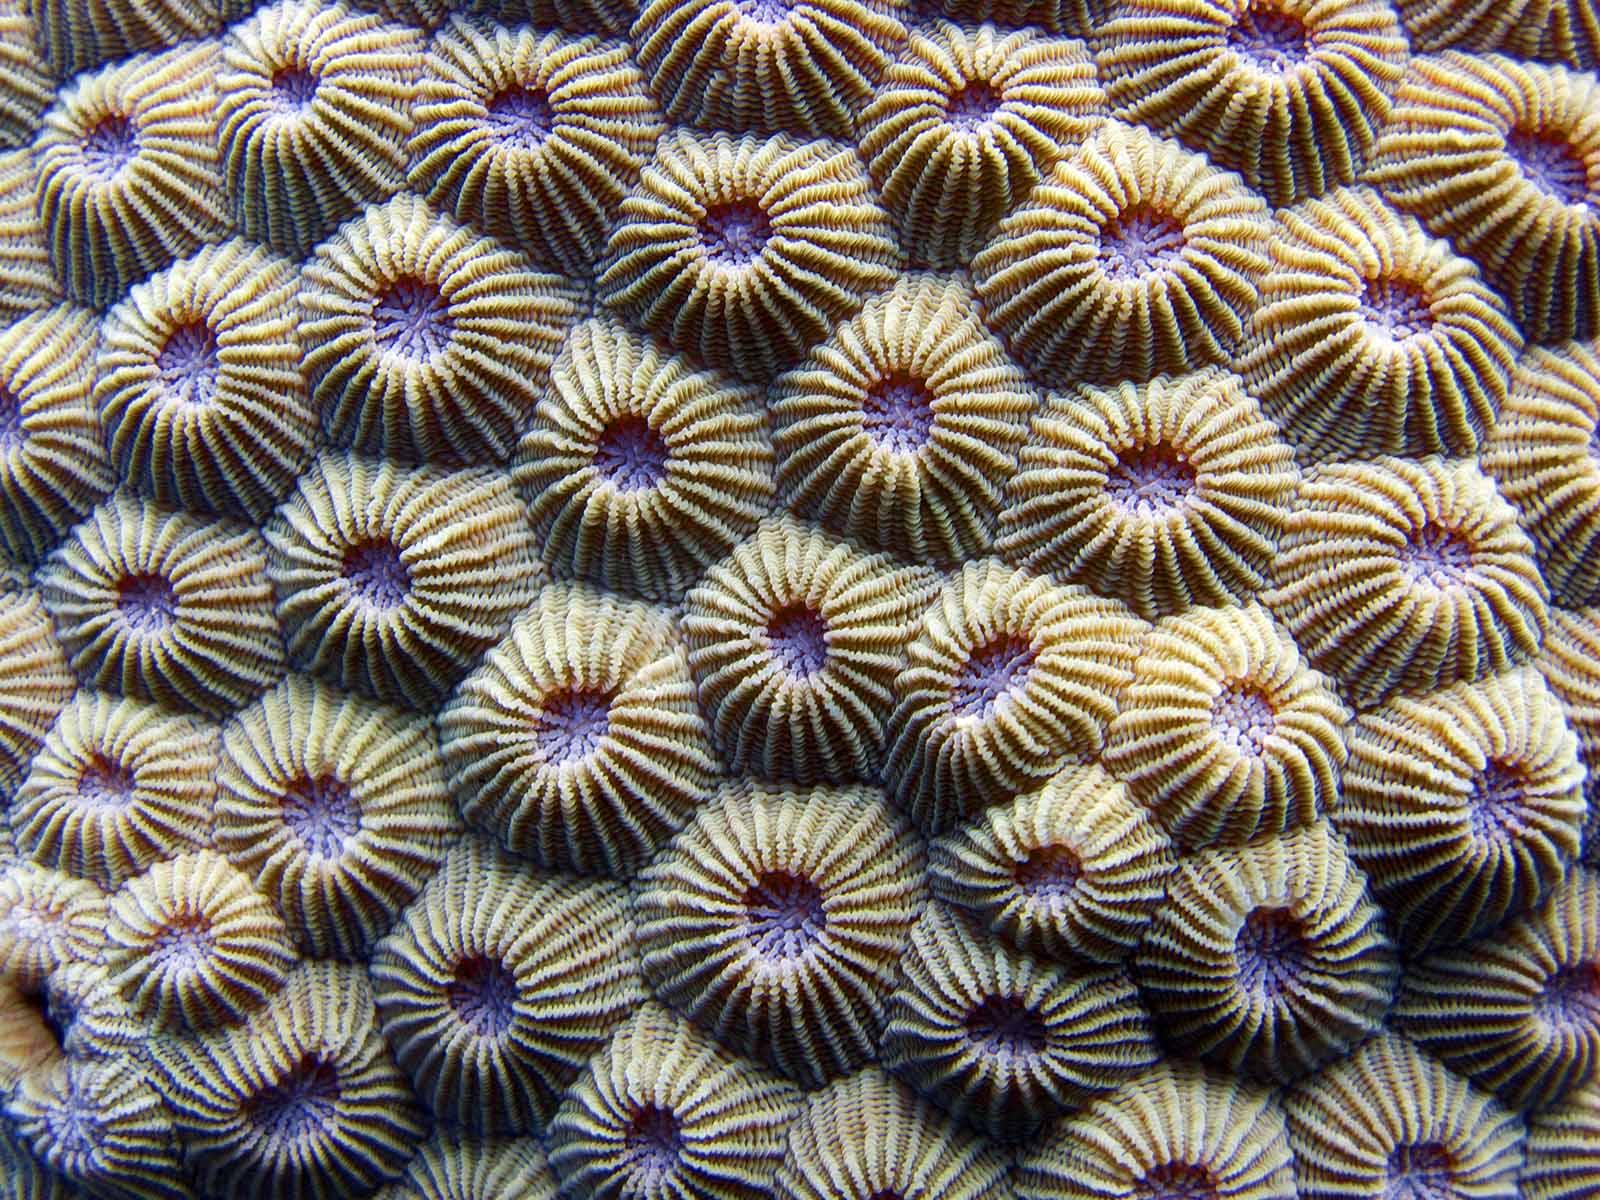 ocean patterns coral ile ilgili görsel sonucu